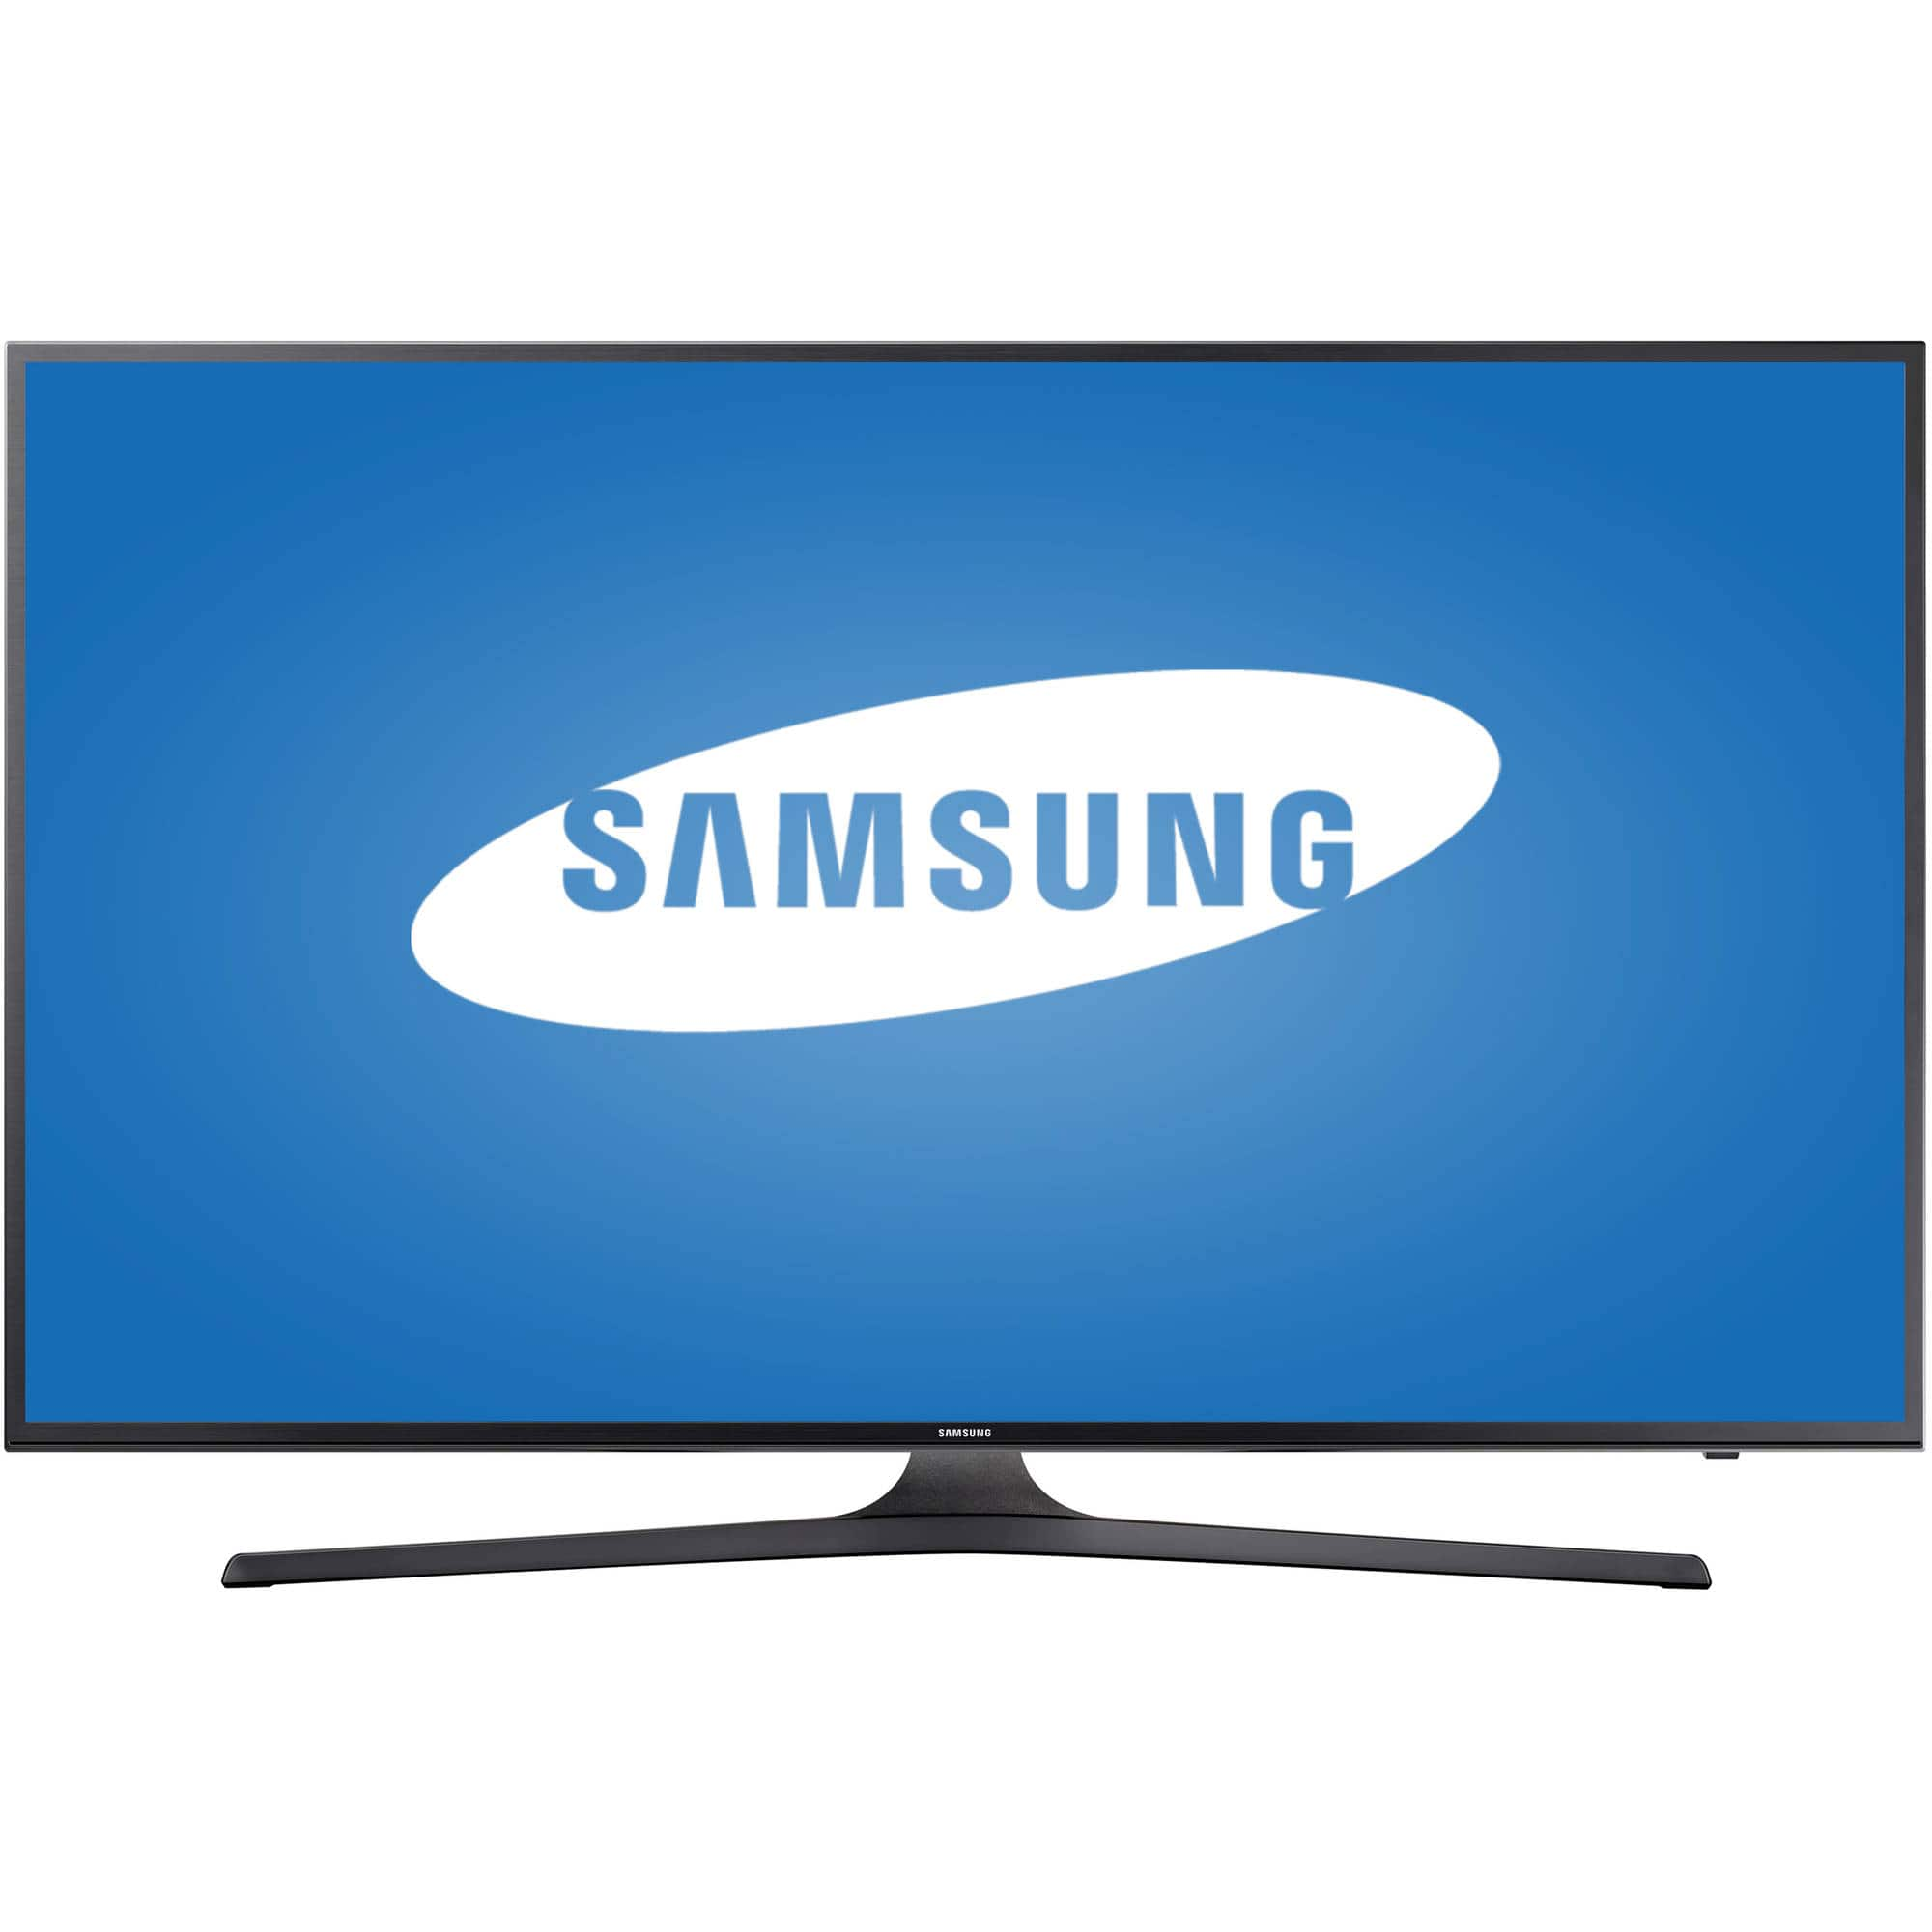 samsung 40 class 4k ultra hd smart led tv 2160p 60hz un40ku6290. Black Bedroom Furniture Sets. Home Design Ideas